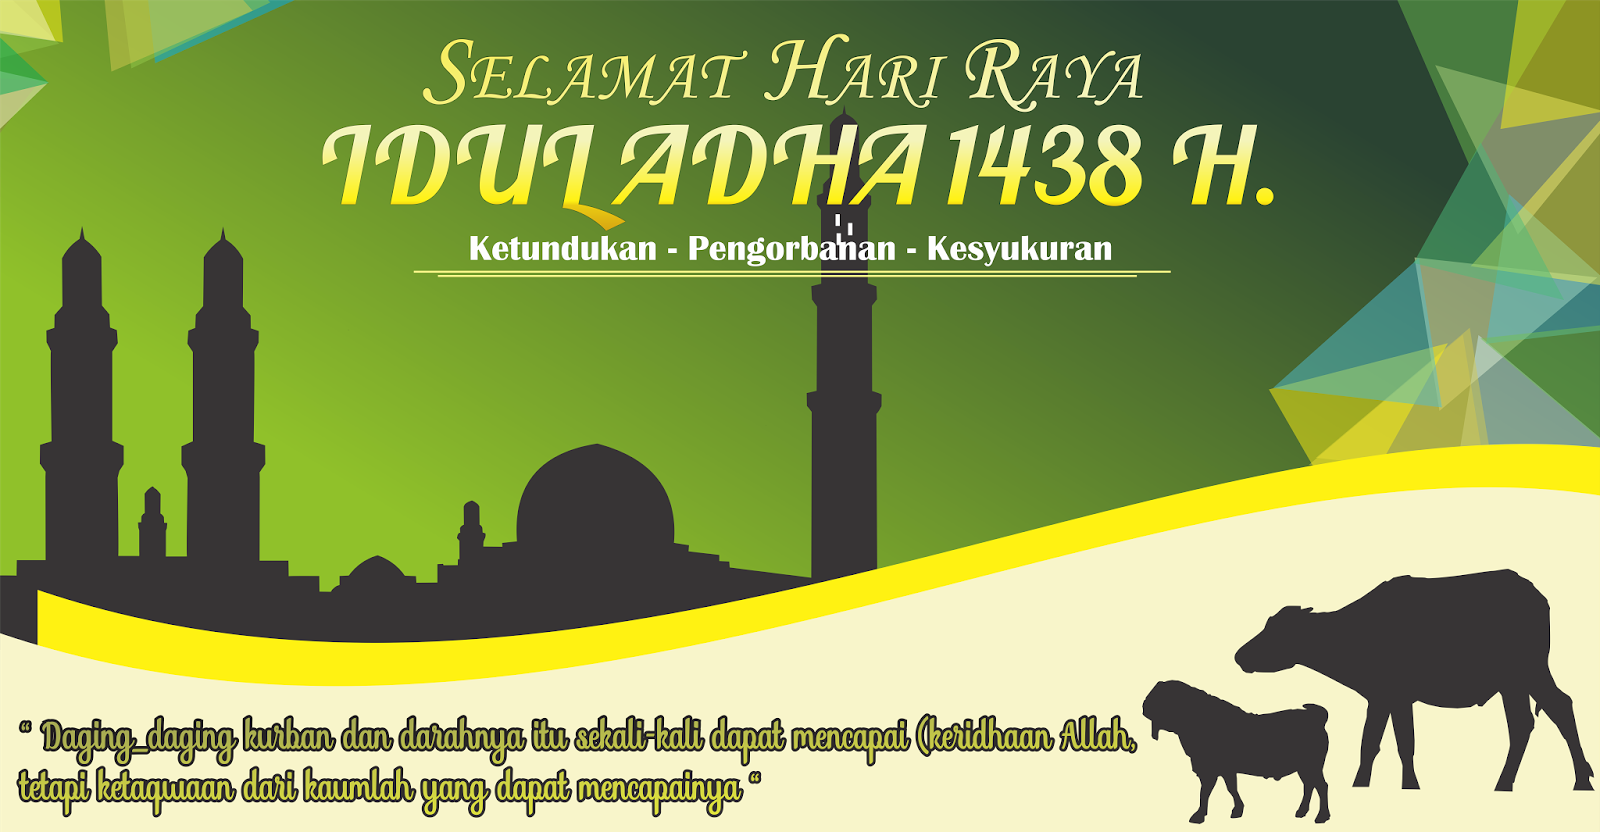 Banner Selamat Hari Raya Idul Adha H